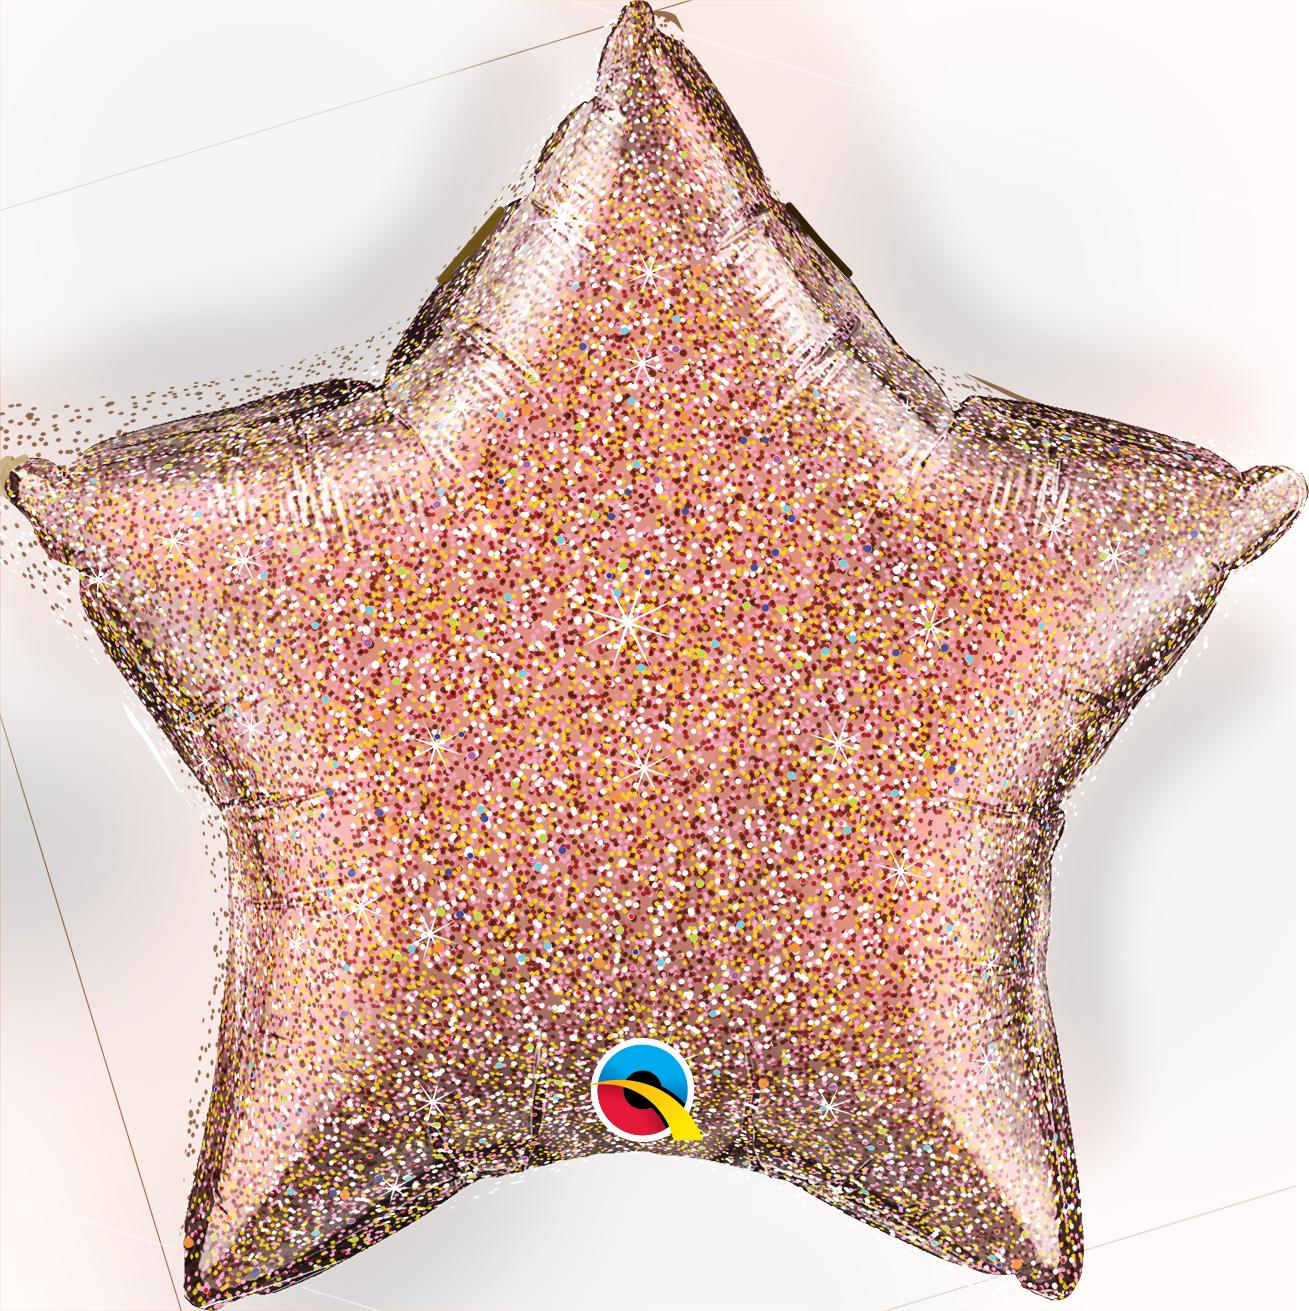 "GLITTERGRAPHIC HEART & STAR BALLOONS 20"" ROSE STAR"